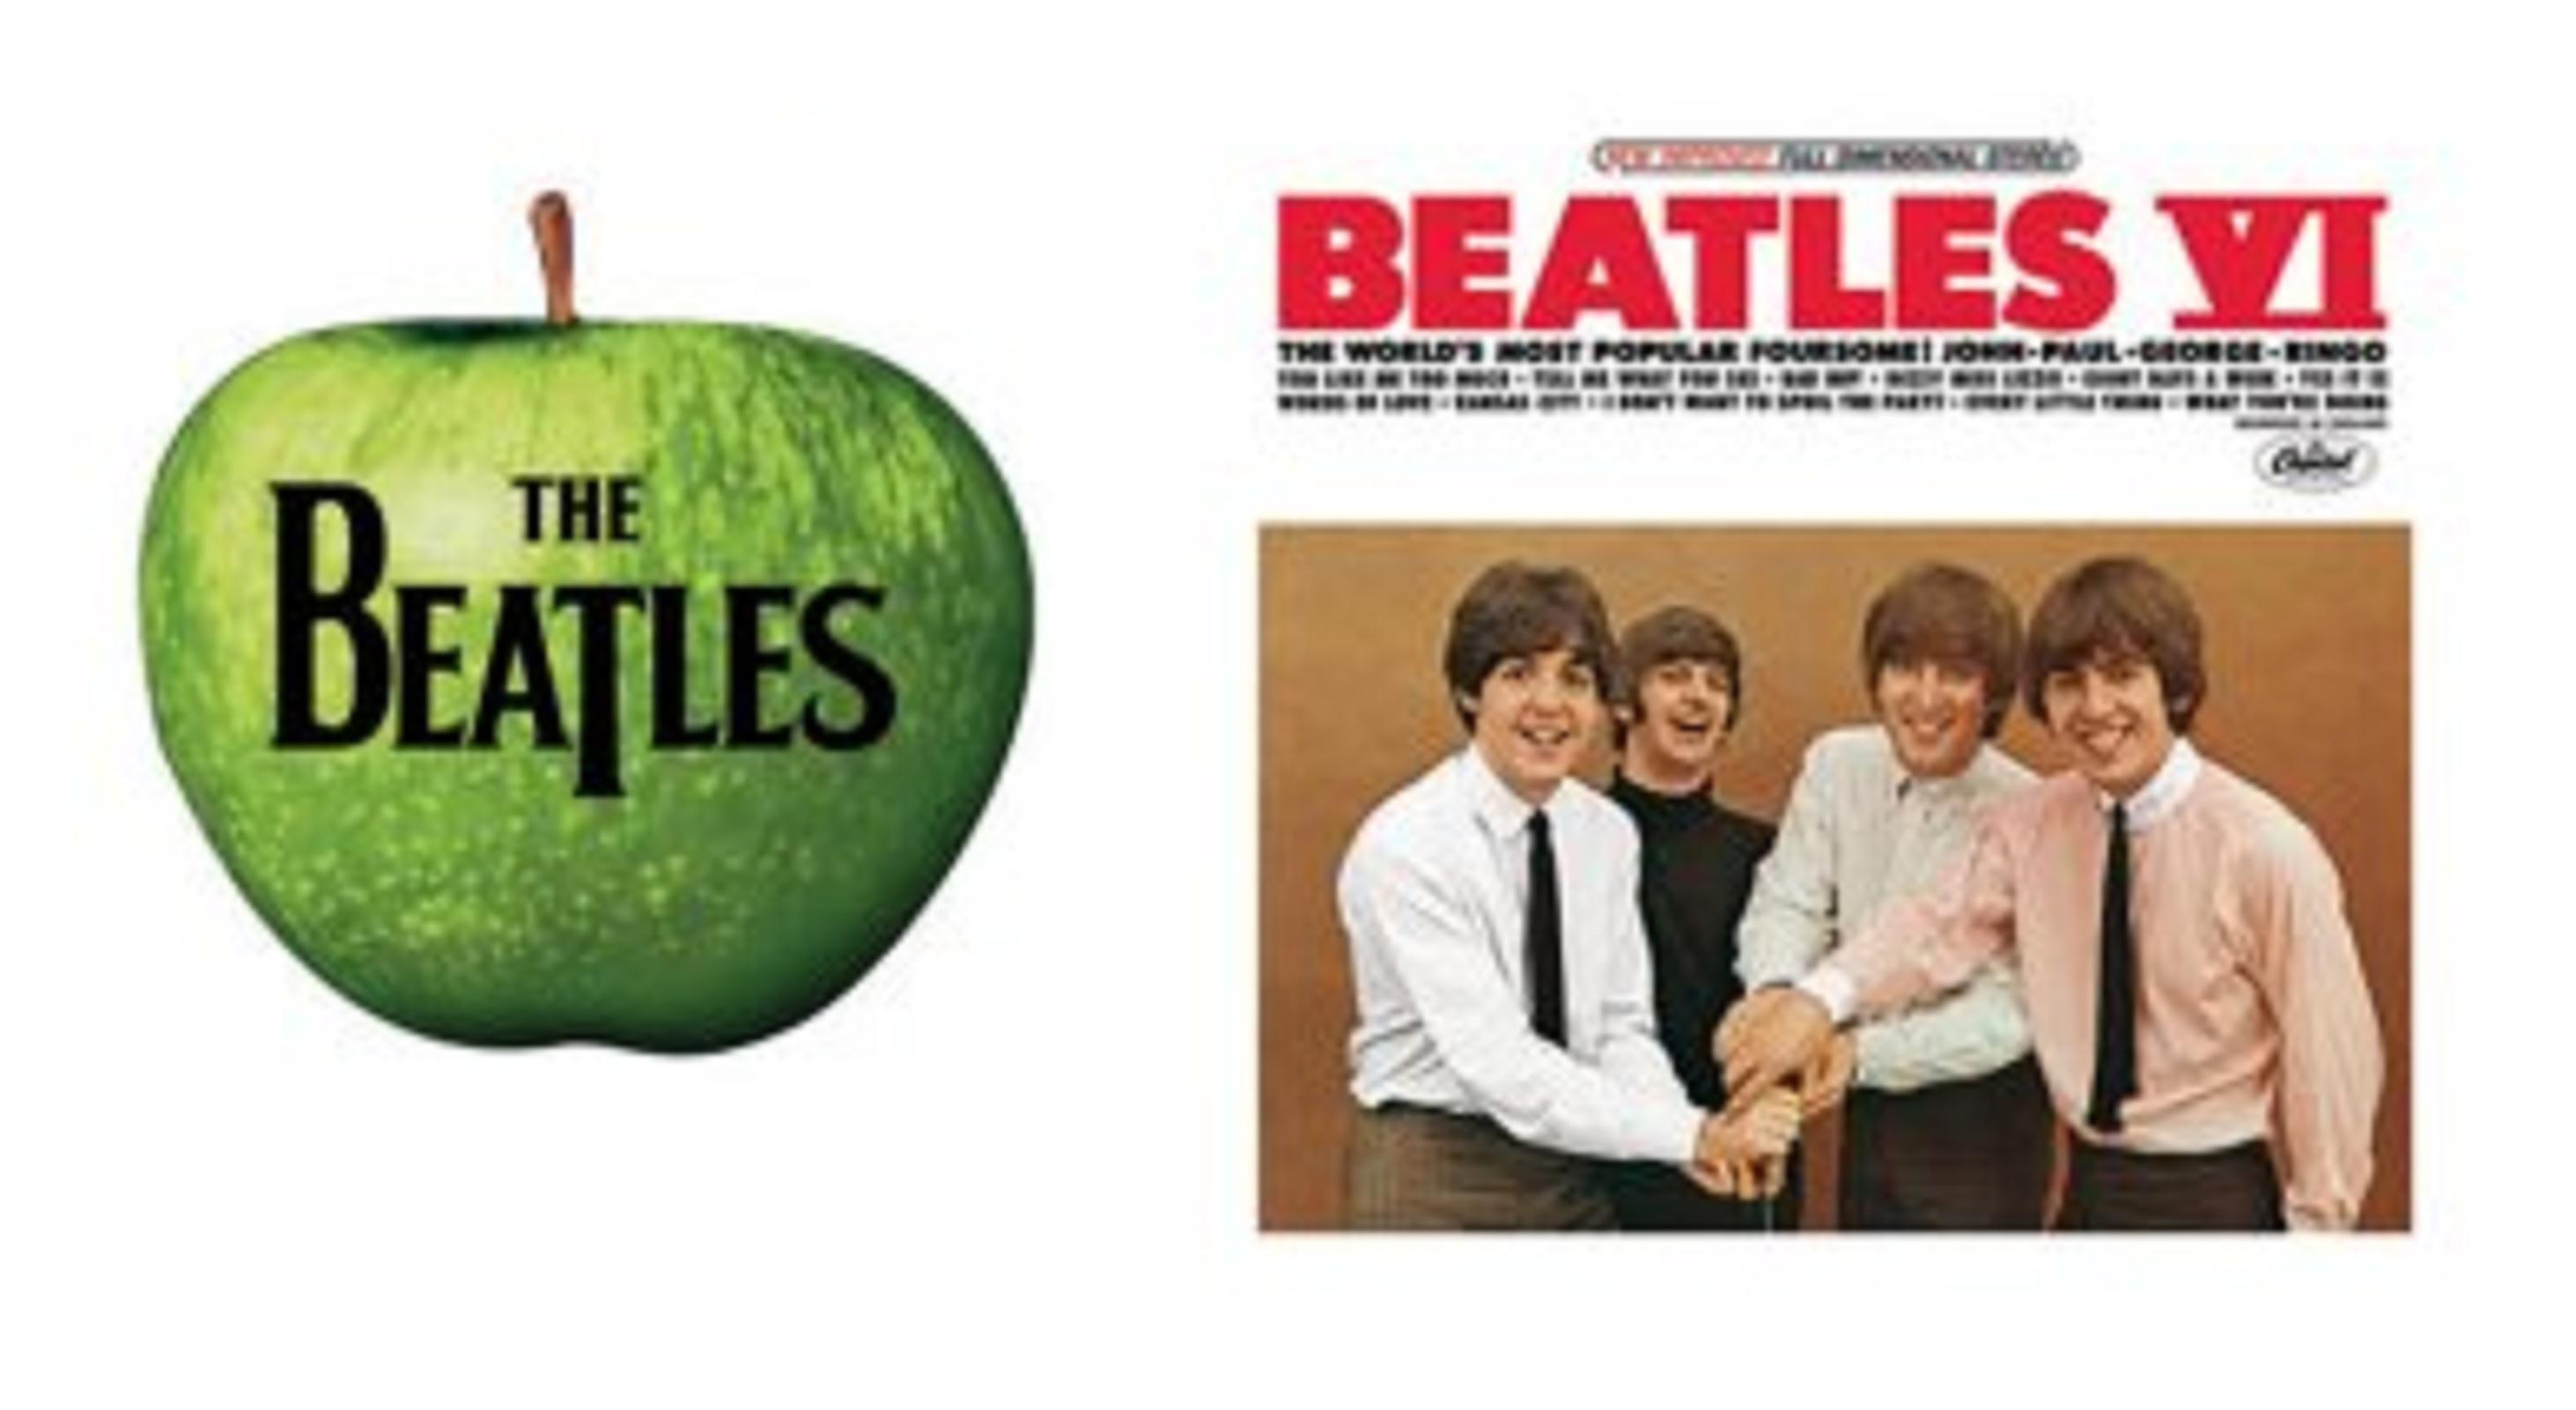 The Beatles Mug Yellow Submarine Abbey Road Band Logo New Official Apple